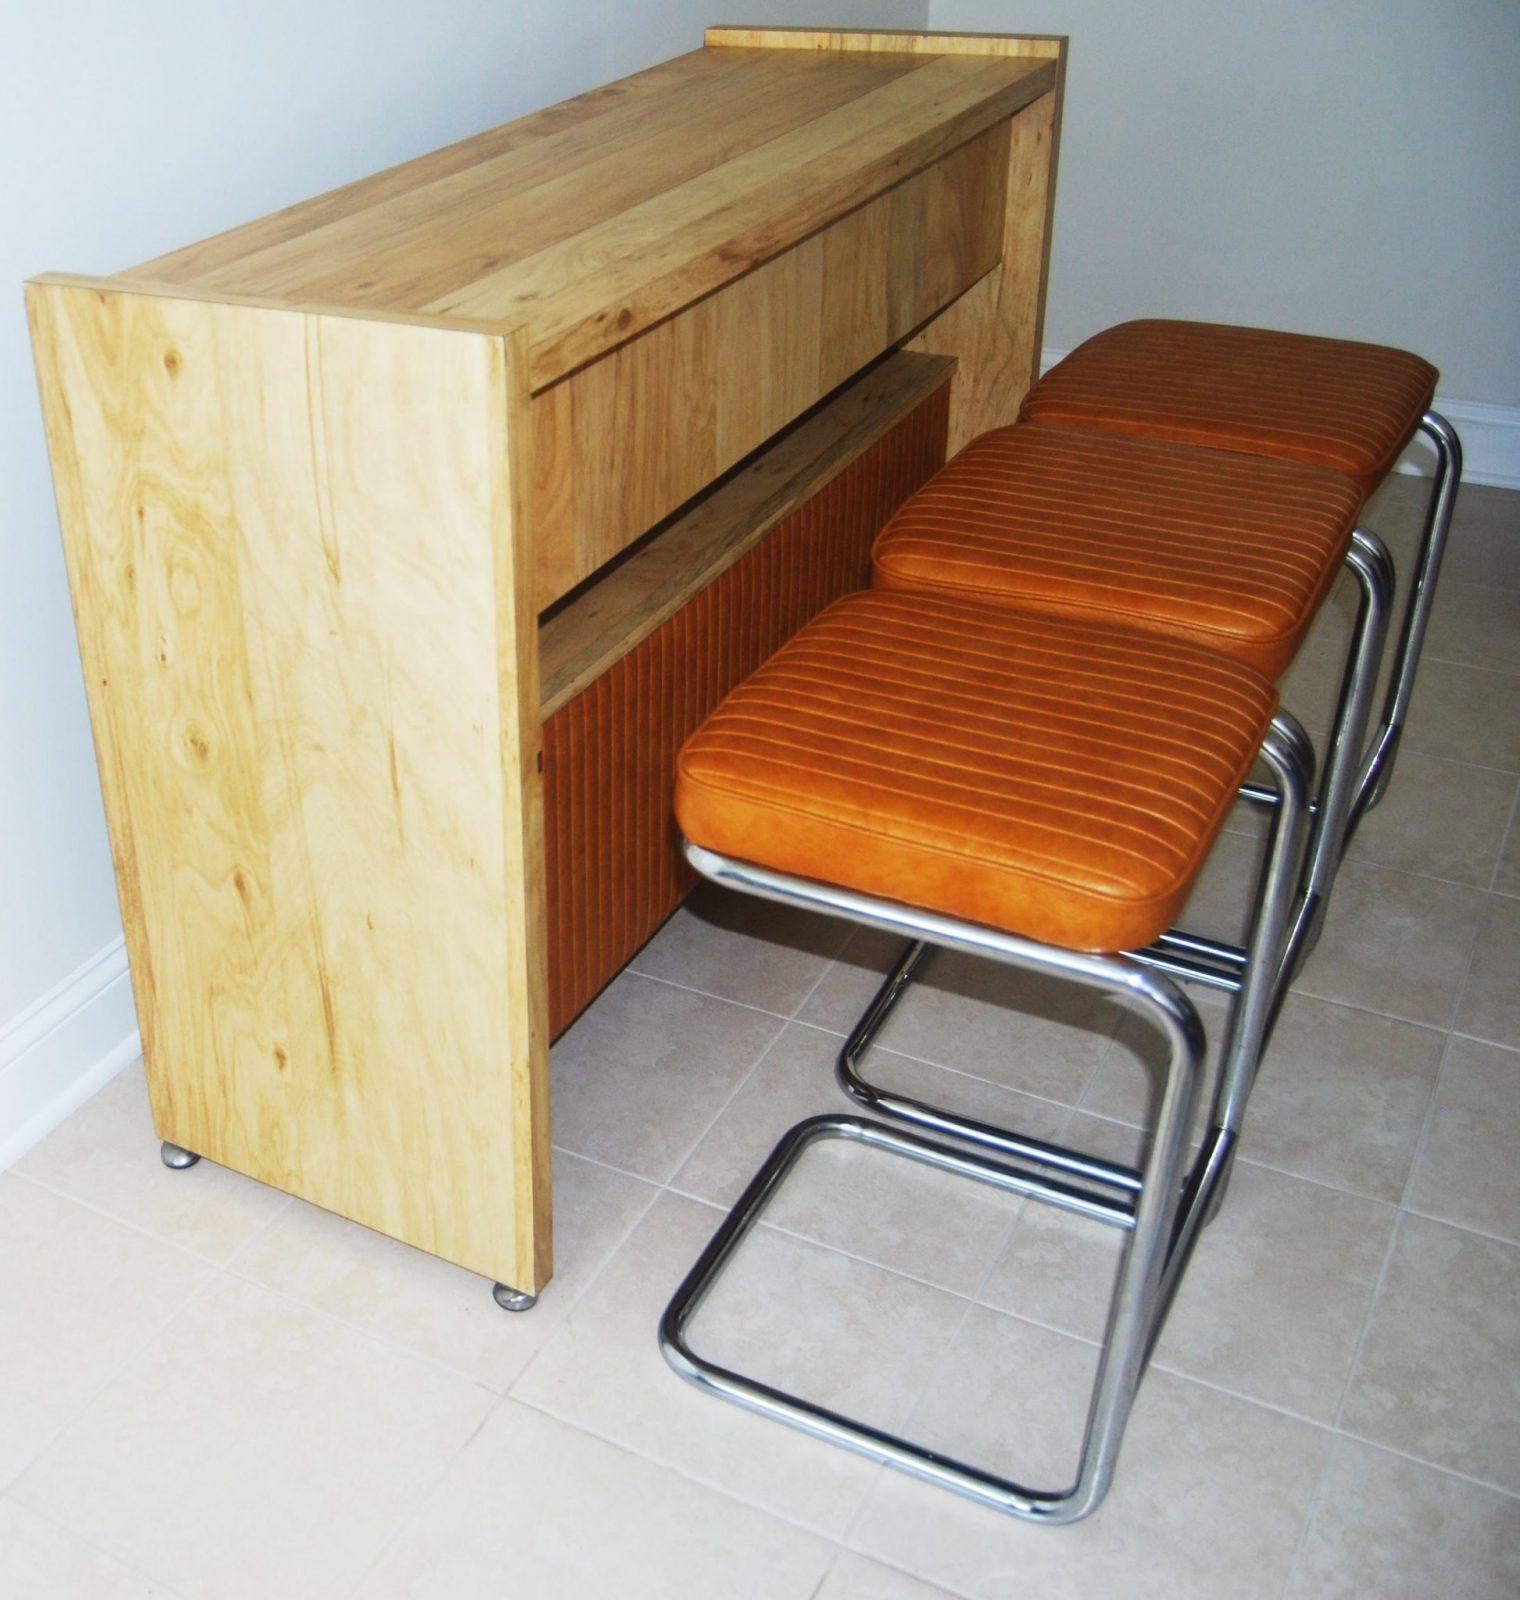 Modern Bar Sets: Mid-century Modern Bar With Matching Bar Stools